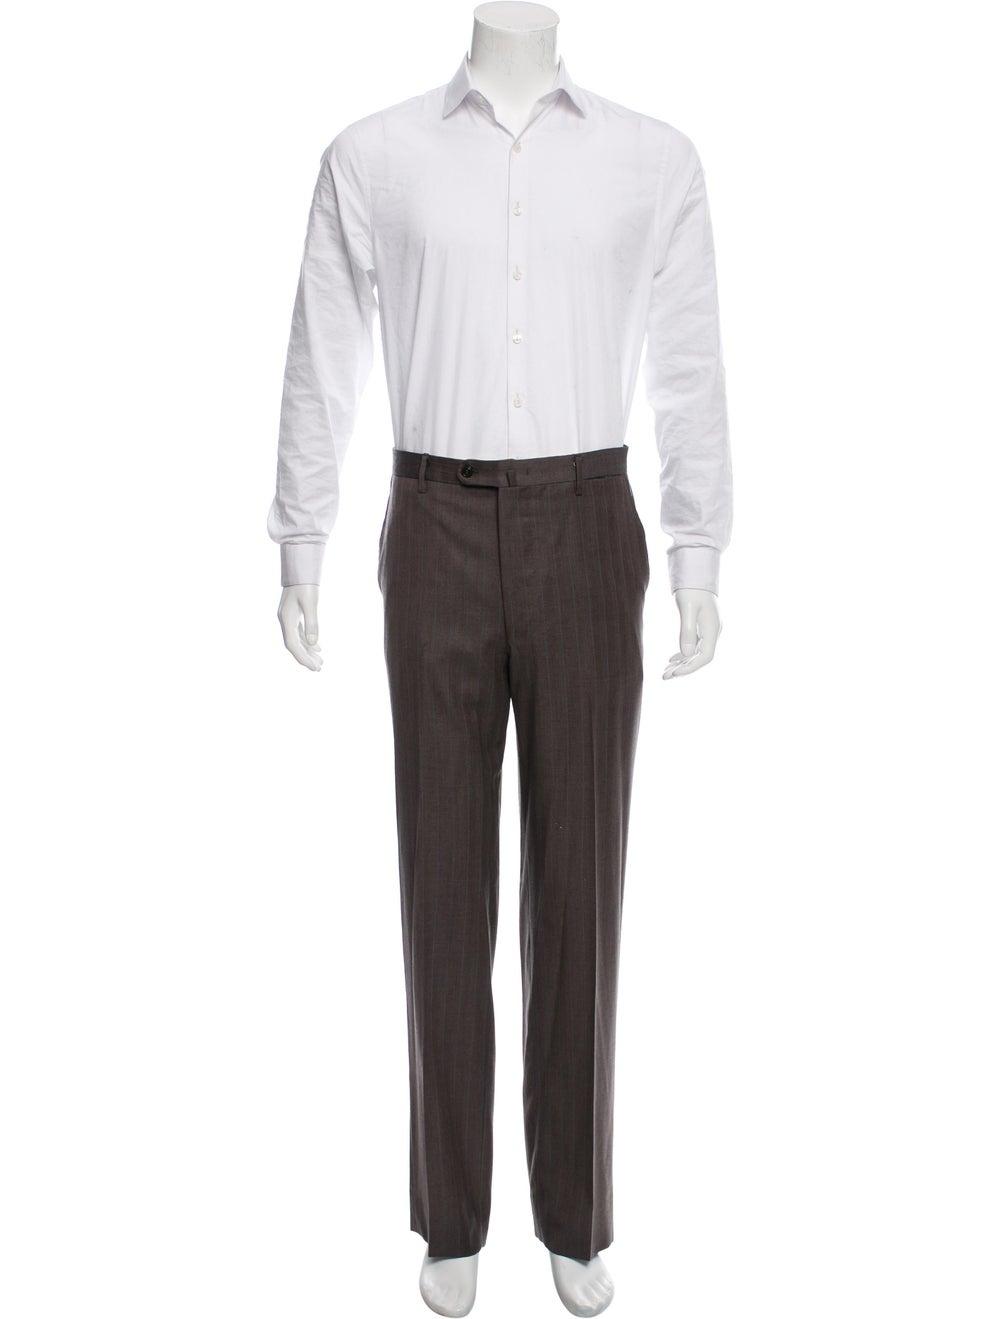 Battistoni Silk-Blend Pinstriped Two-Piece Suit - image 4